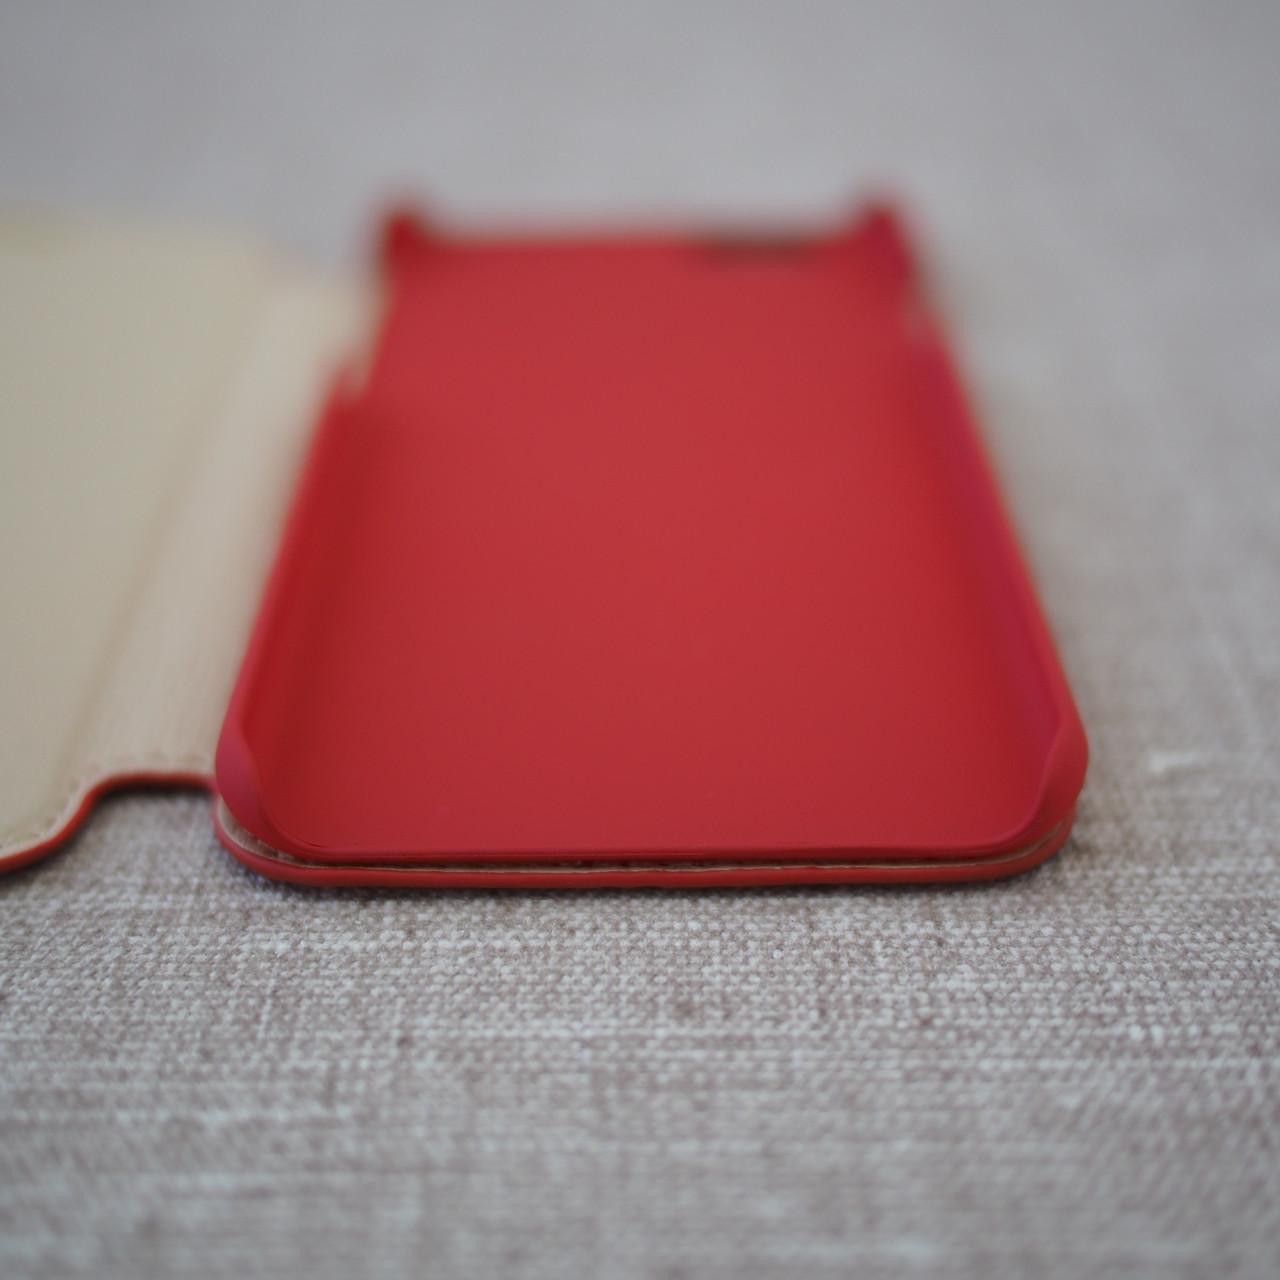 ROCK Jazz iPhone 6 red